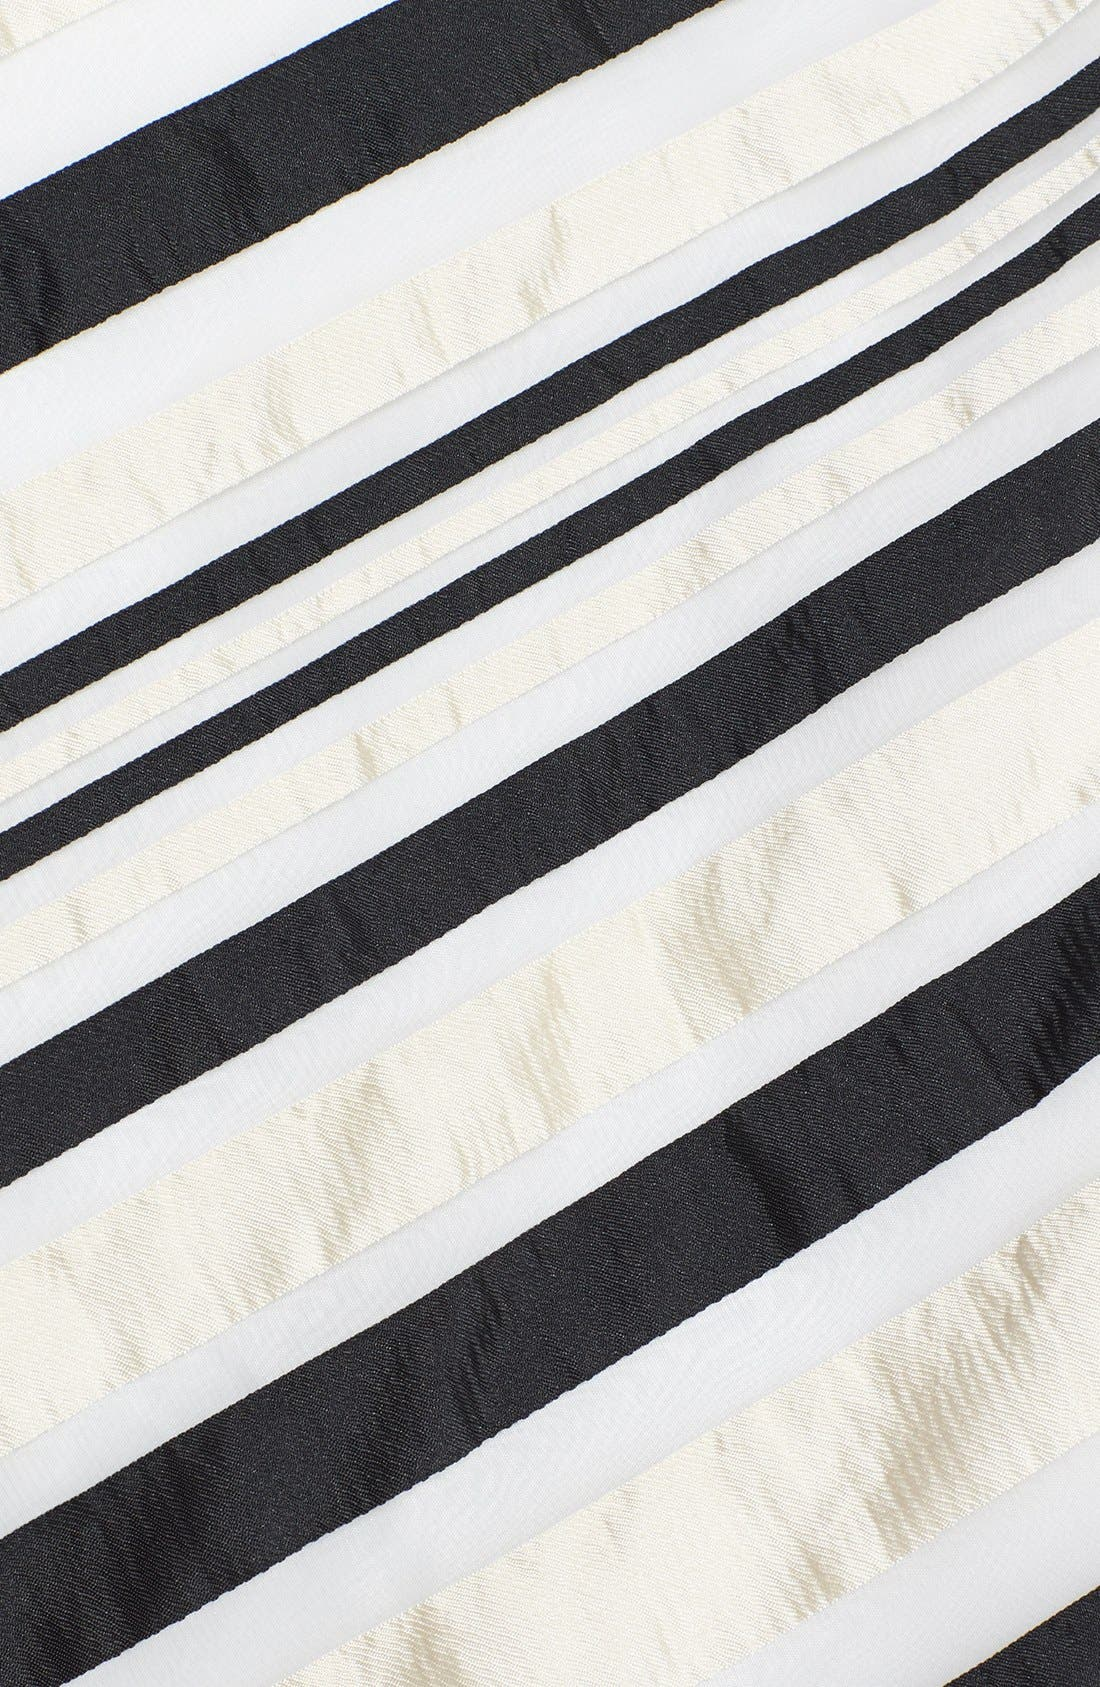 Ribbon Stripe Strapless Dress,                             Alternate thumbnail 3, color,                             001